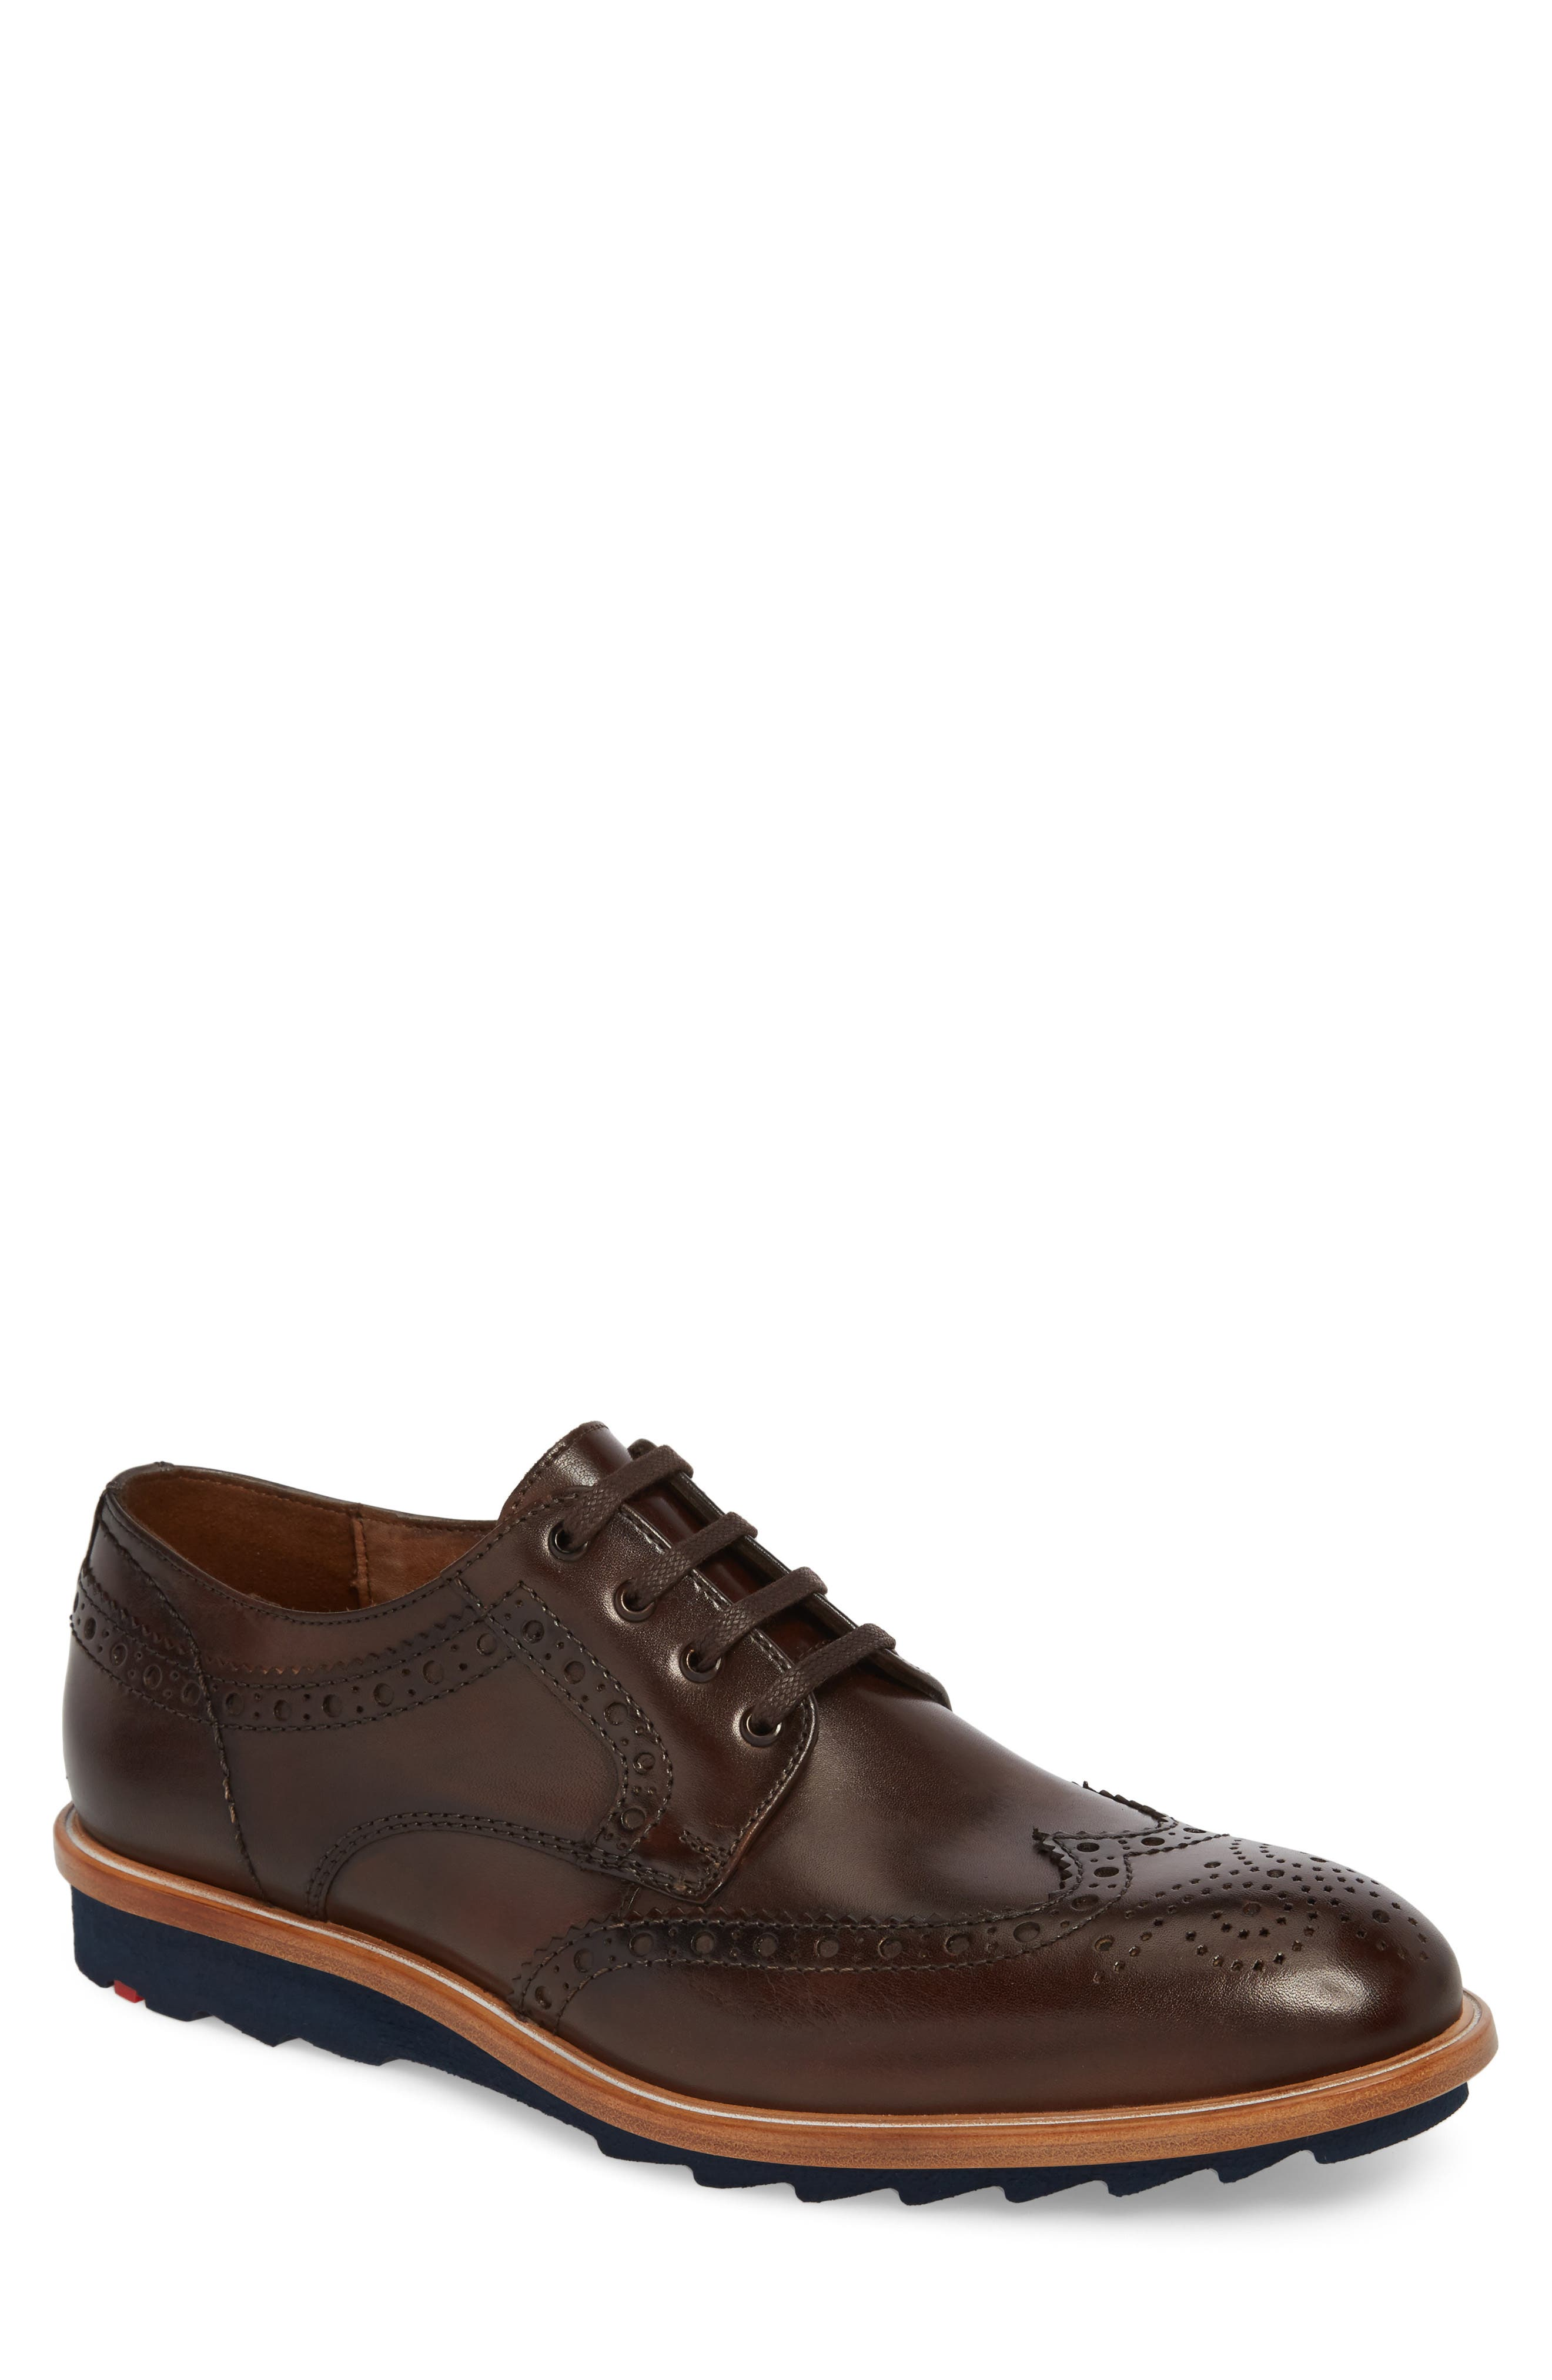 Fairbanks Wingtip,                             Main thumbnail 1, color,                             Brown Leather